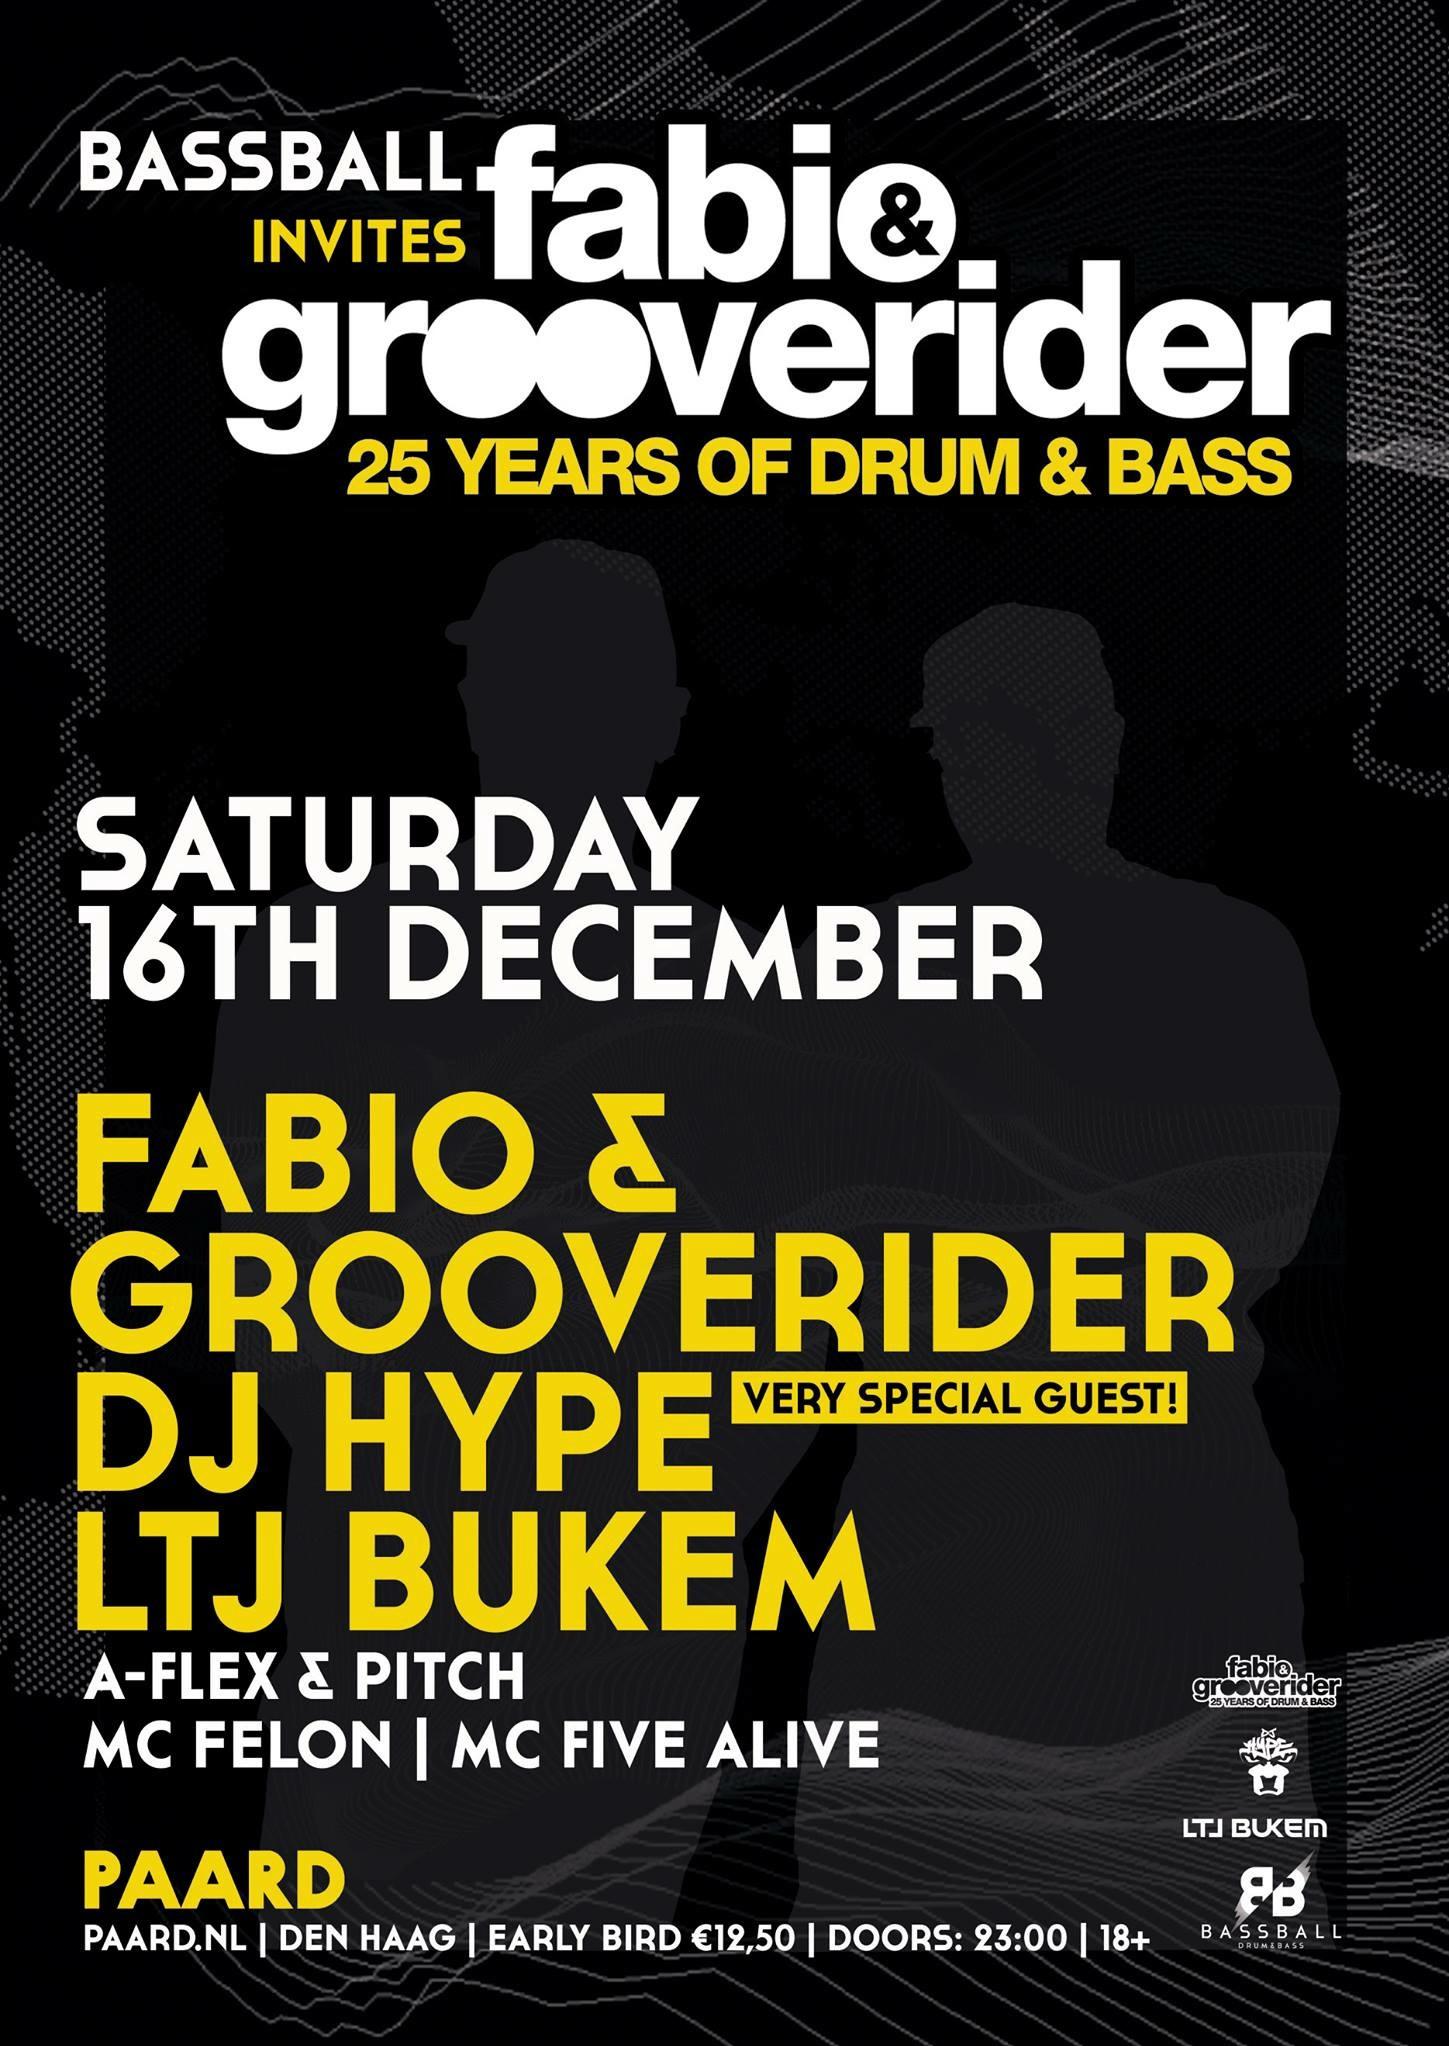 Bassball invites Fabio & Grooverider